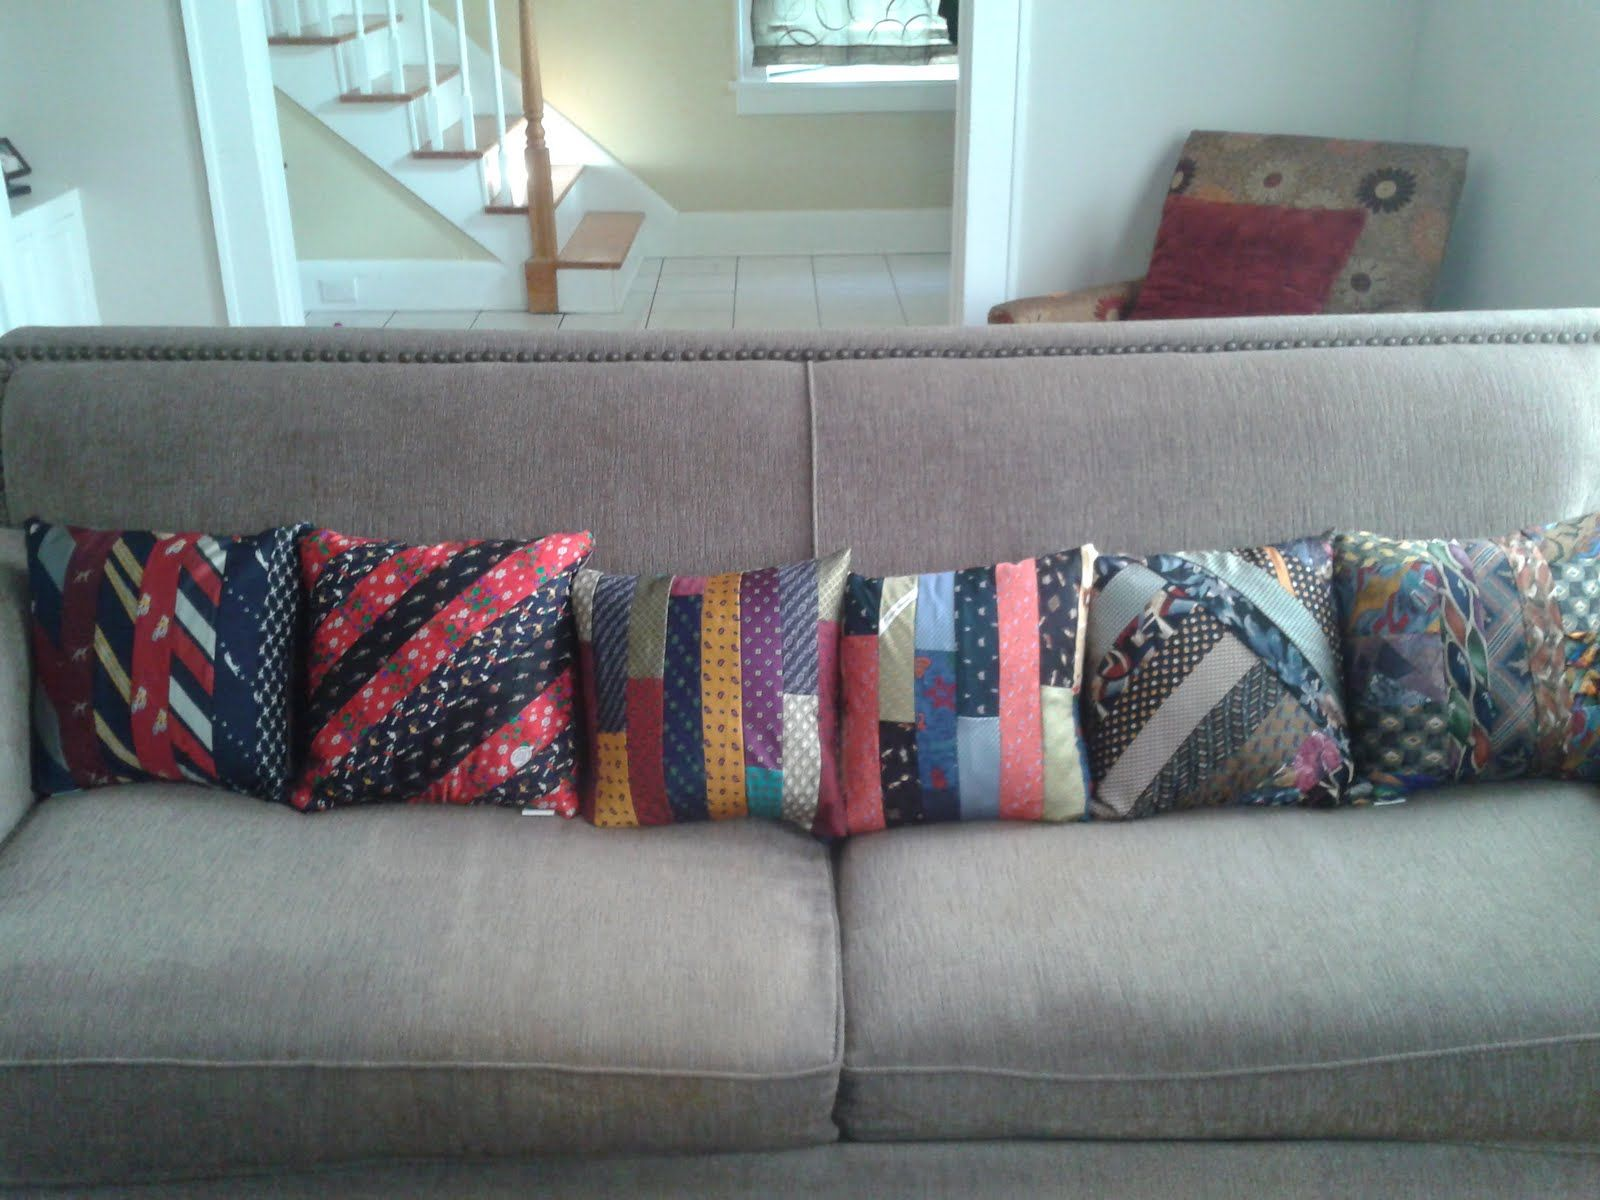 upcycling krawatten neue ideen n hen krawatte und alte krawatten. Black Bedroom Furniture Sets. Home Design Ideas